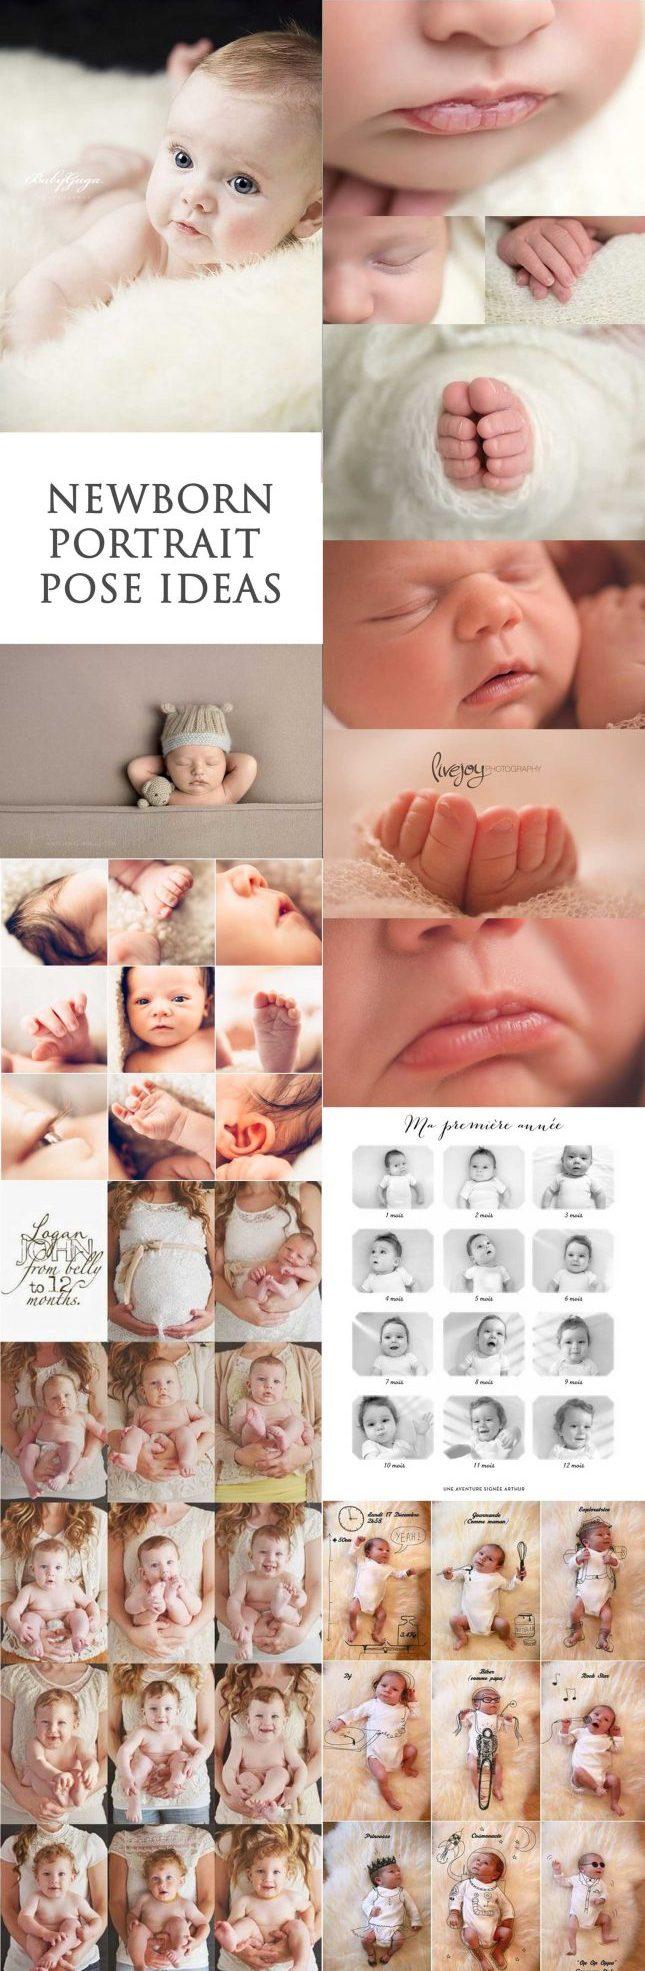 Baby PortraitsAlone